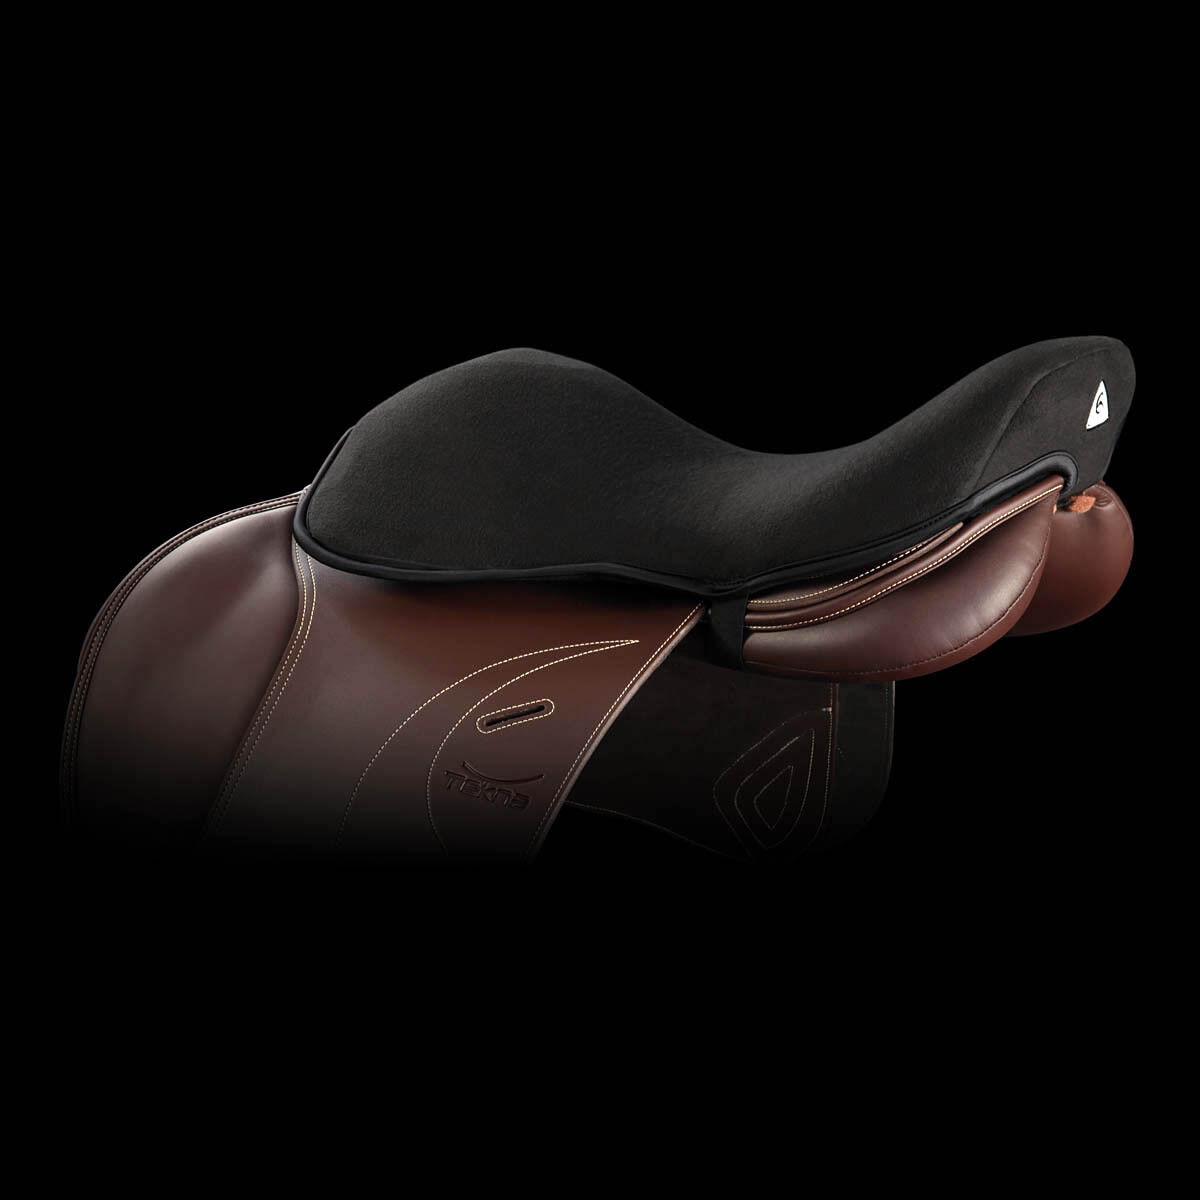 Copriseggio in gel sella inglese ACavallo seat saver saddle